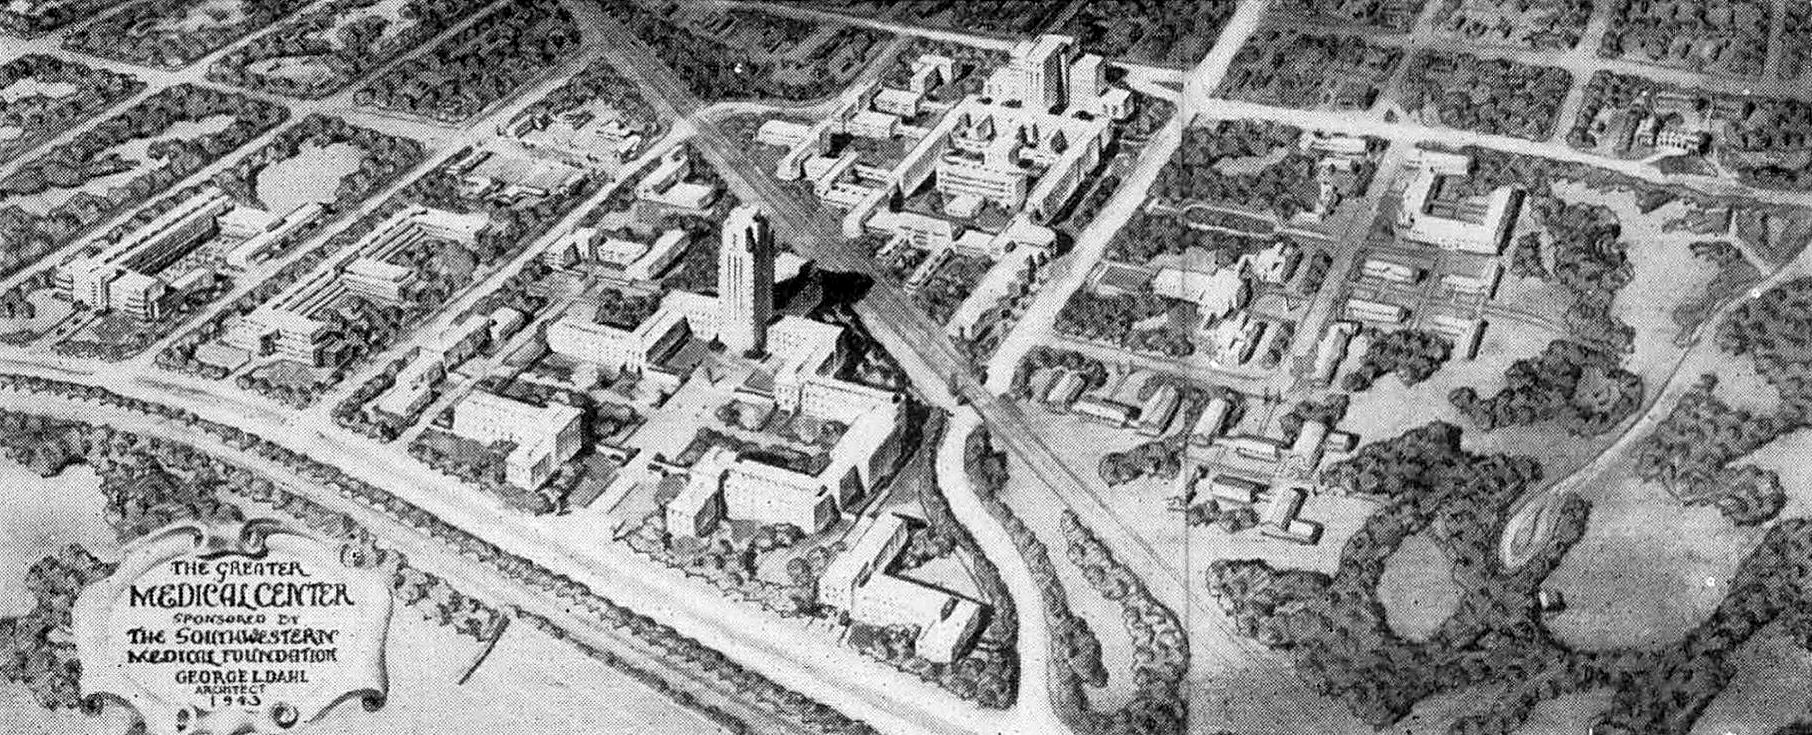 southwestern-medical-college_1944 yrbk_george-dahl_greater-dallas-medical-center